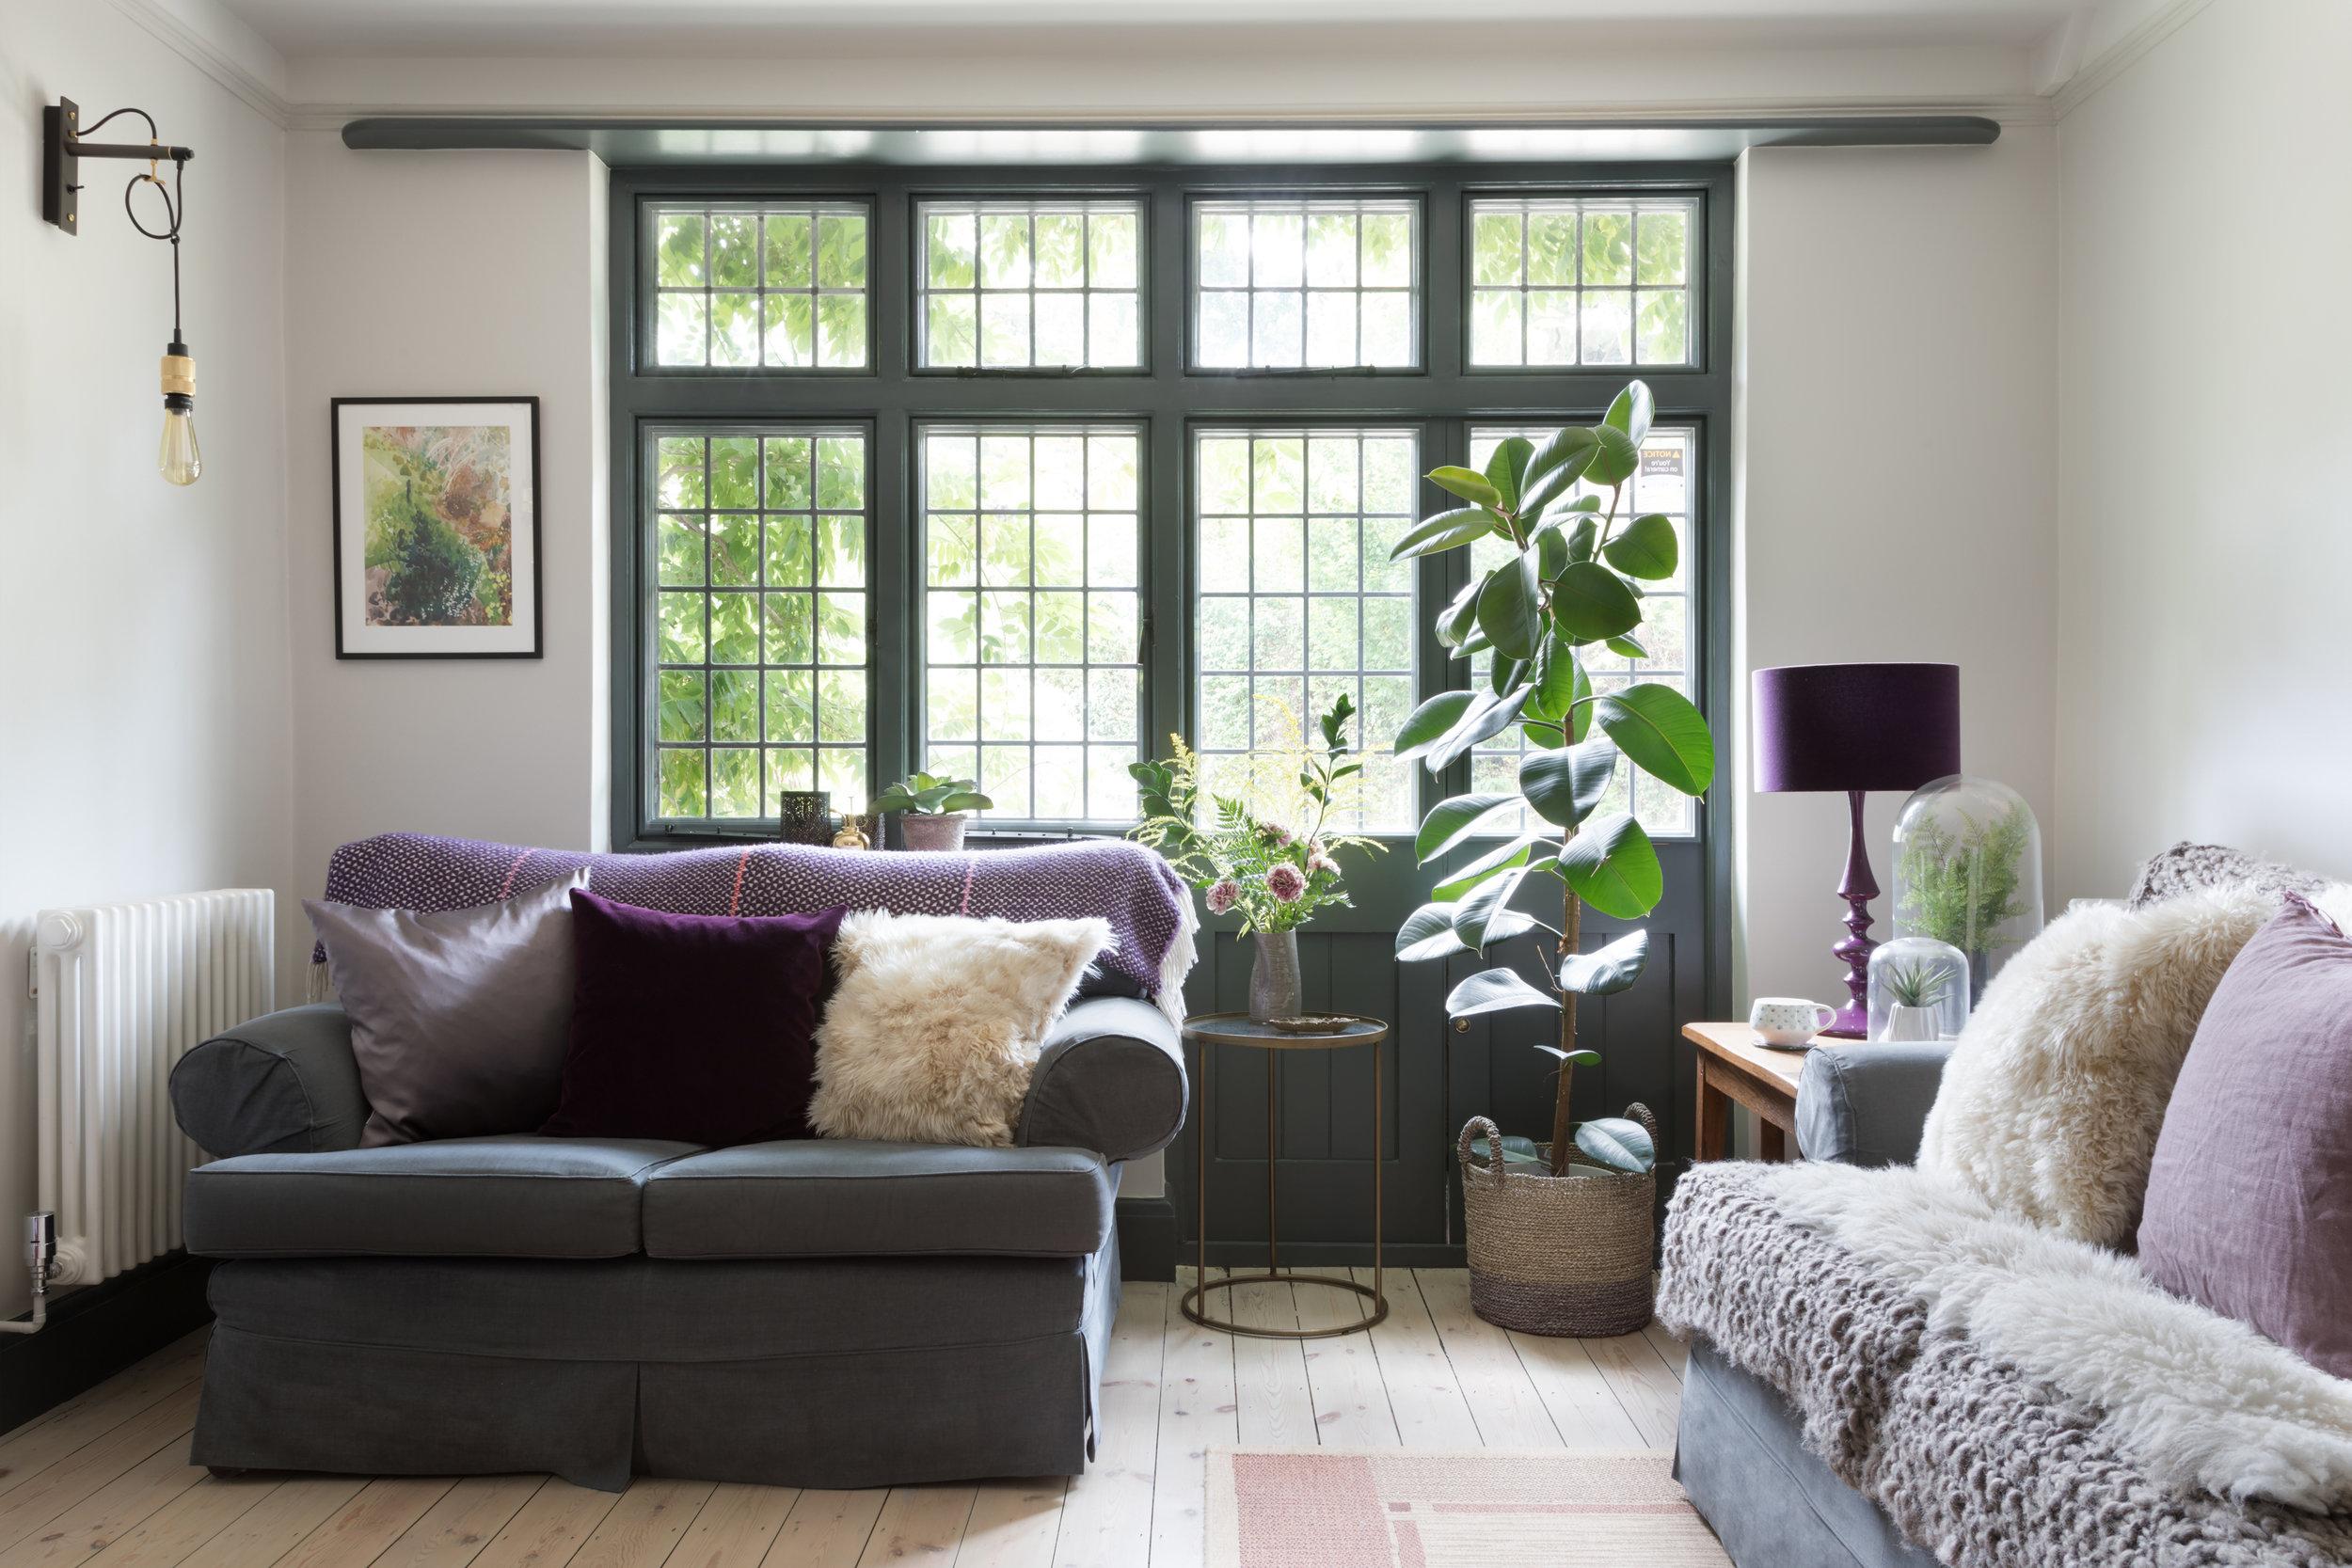 living-room-alison-anderson-interiors-dark-windows.jpg